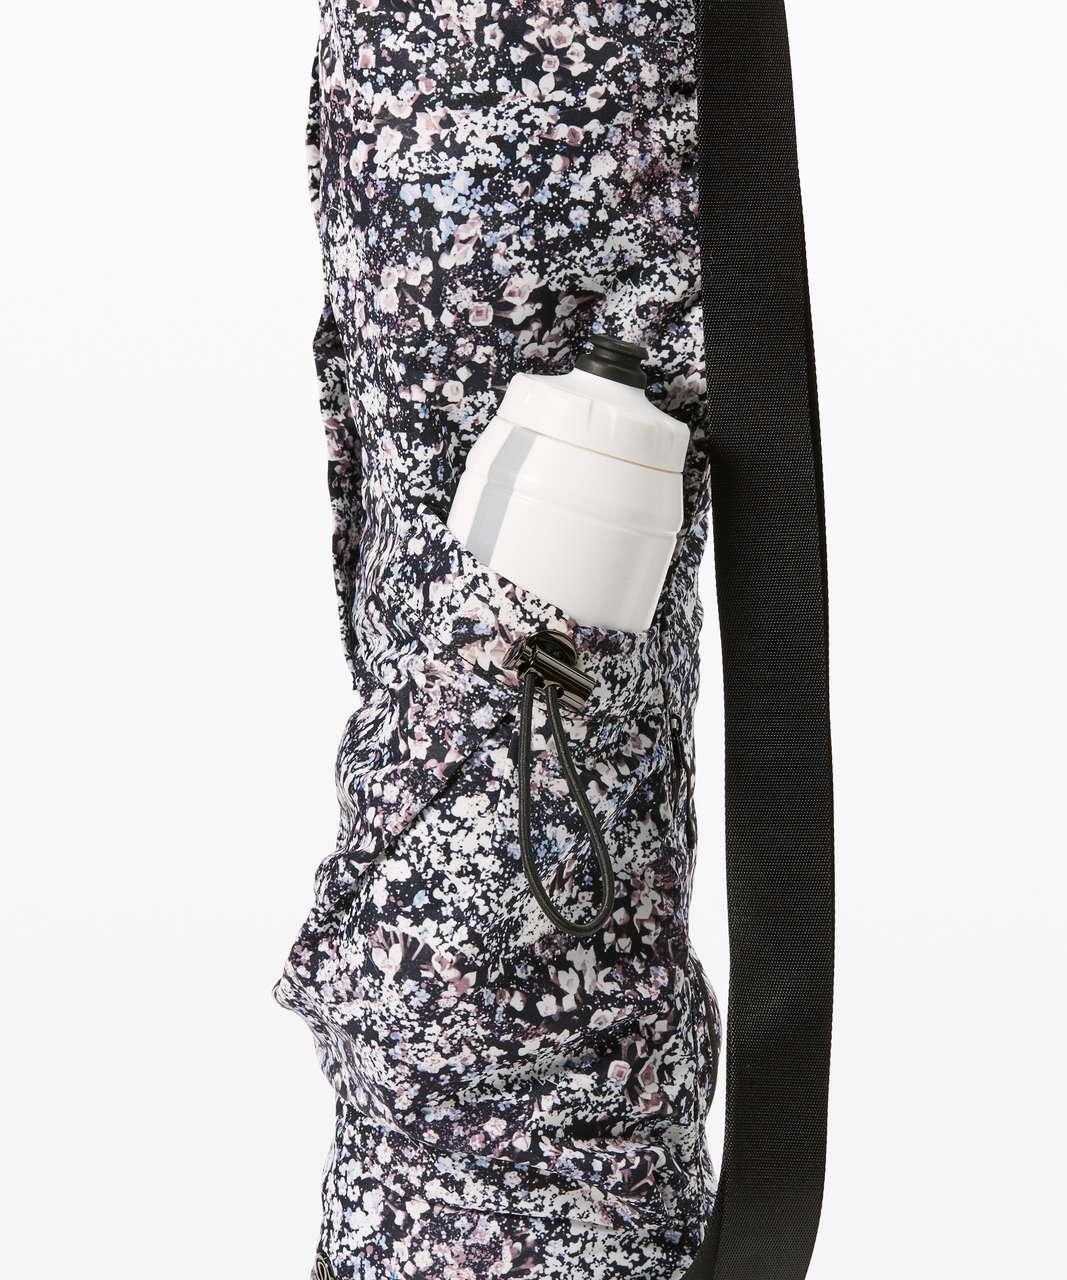 Lululemon The Yoga Mat Bag - Floral Spritz Multi